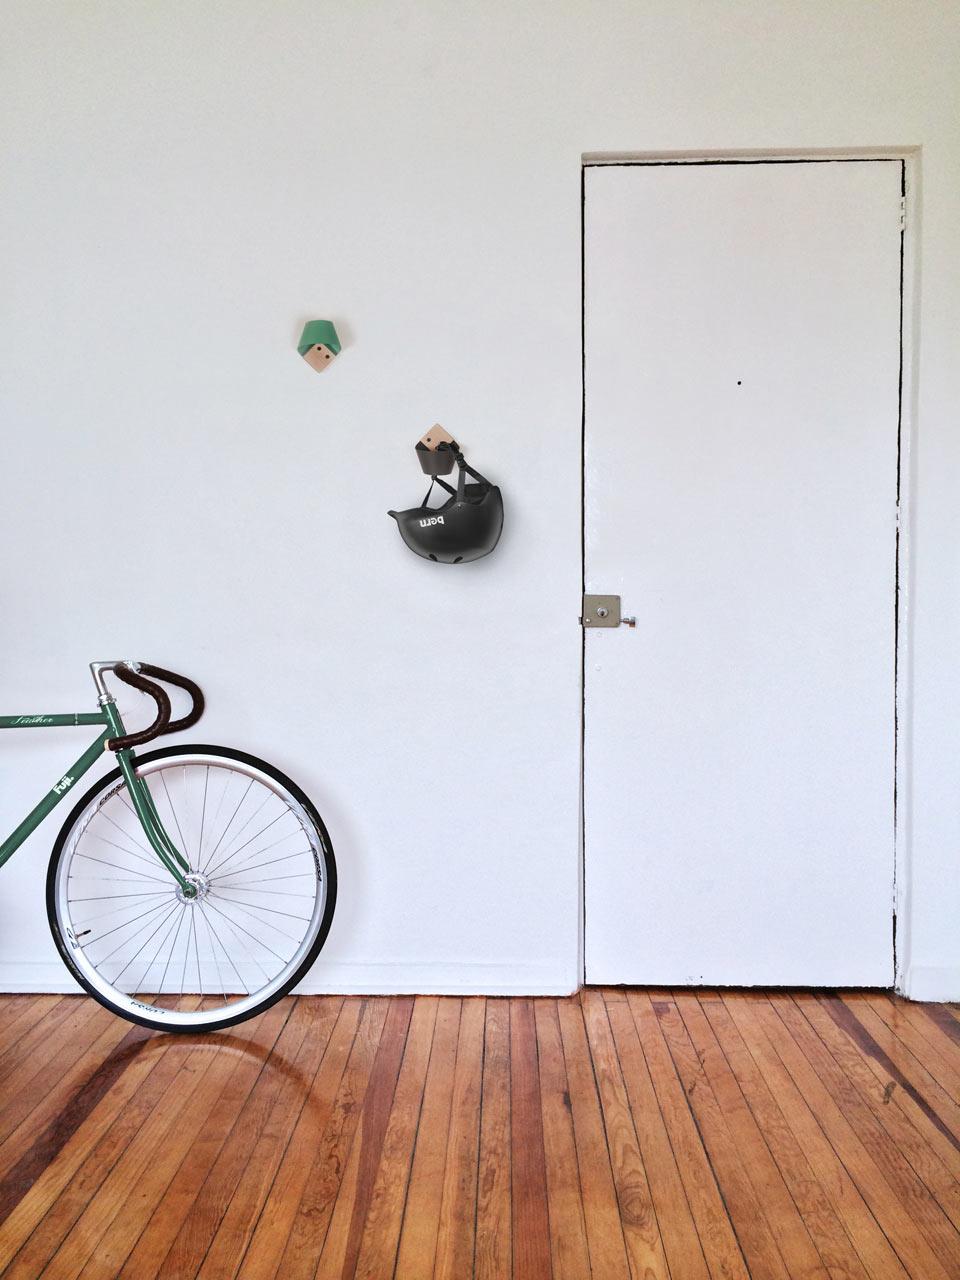 Loop-Wall-Hook-LaSelva-design-studio-4